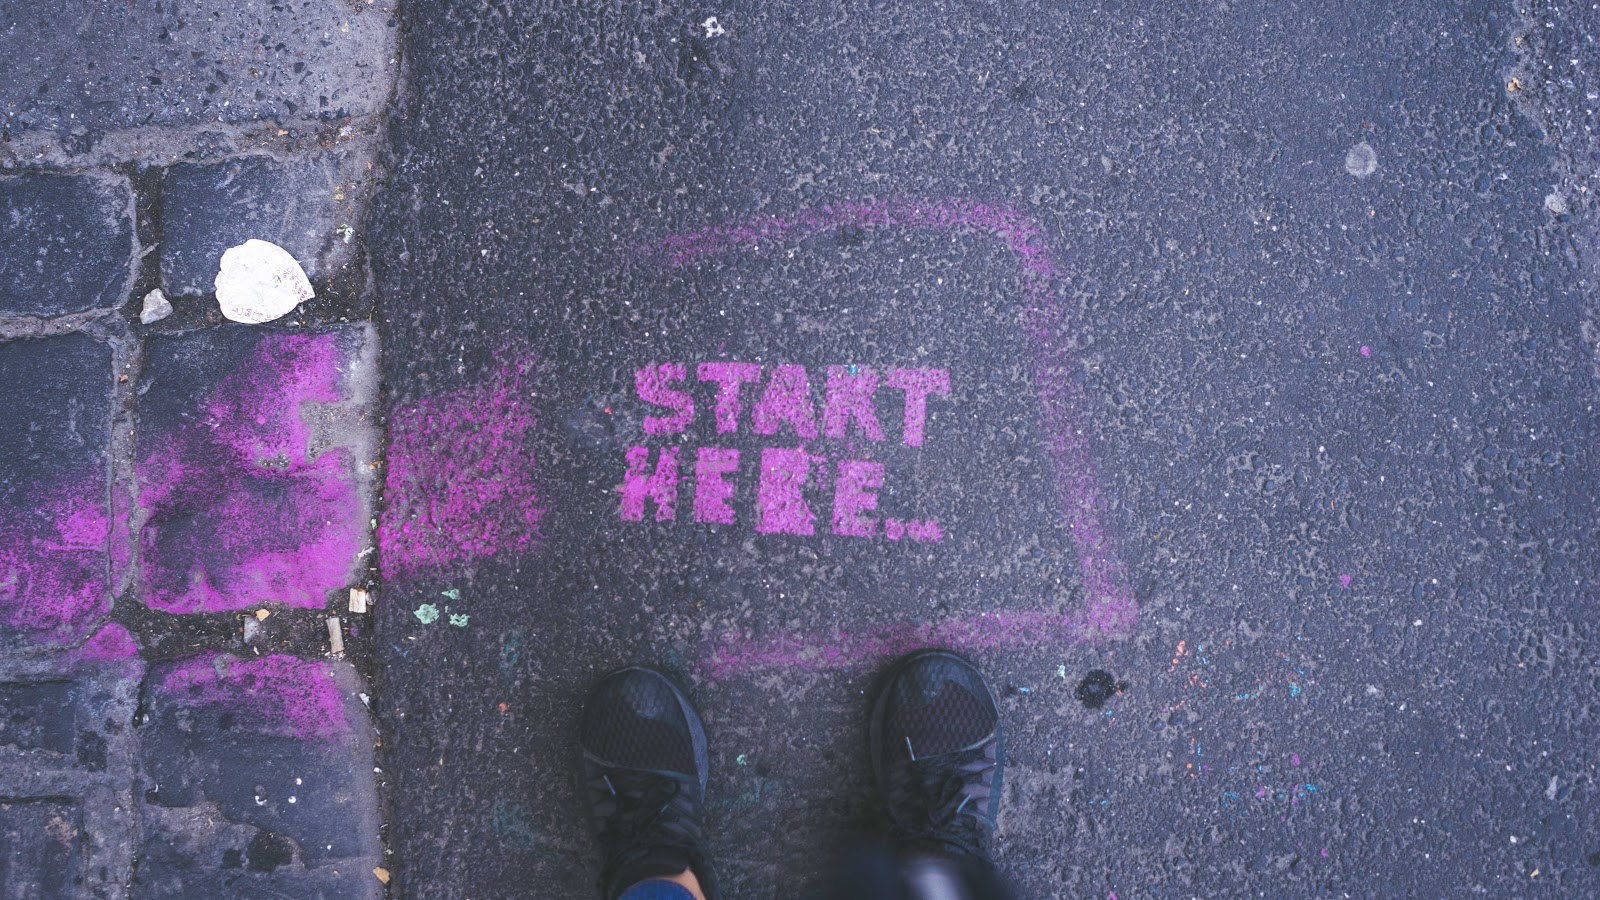 """Start here"" written on the ground"